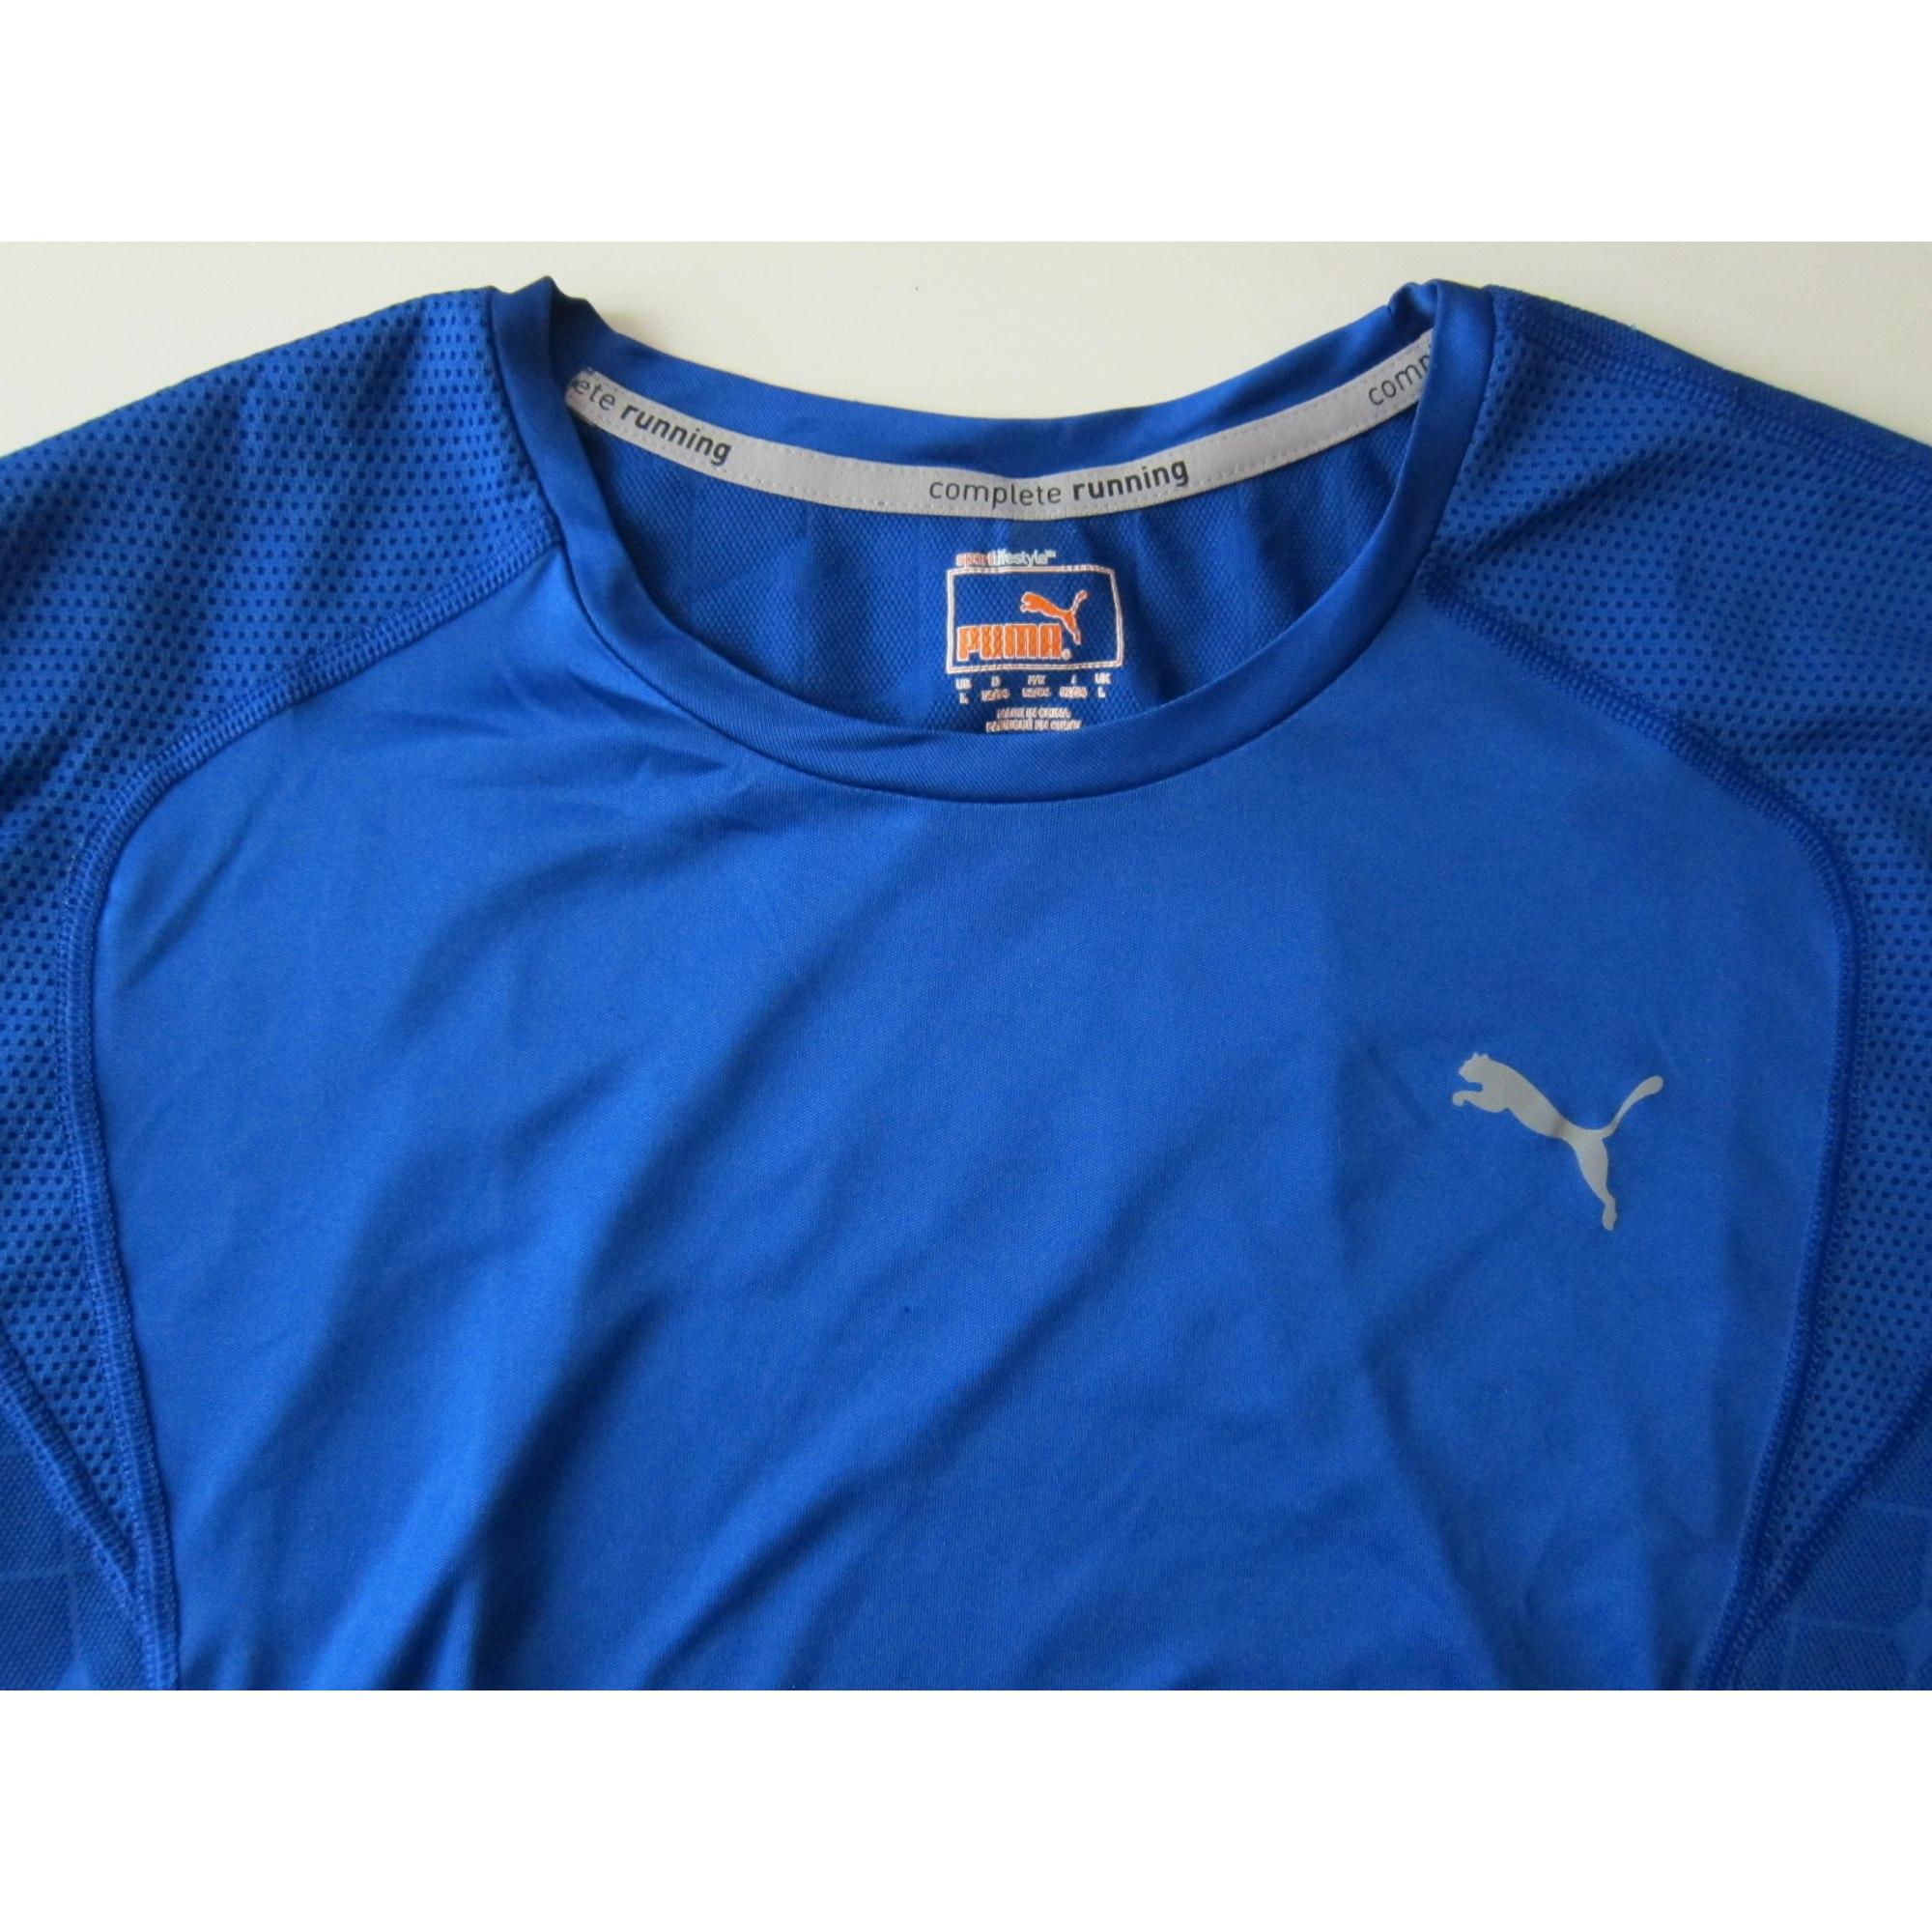 Tee-shirt PUMA Bleu, bleu marine, bleu turquoise